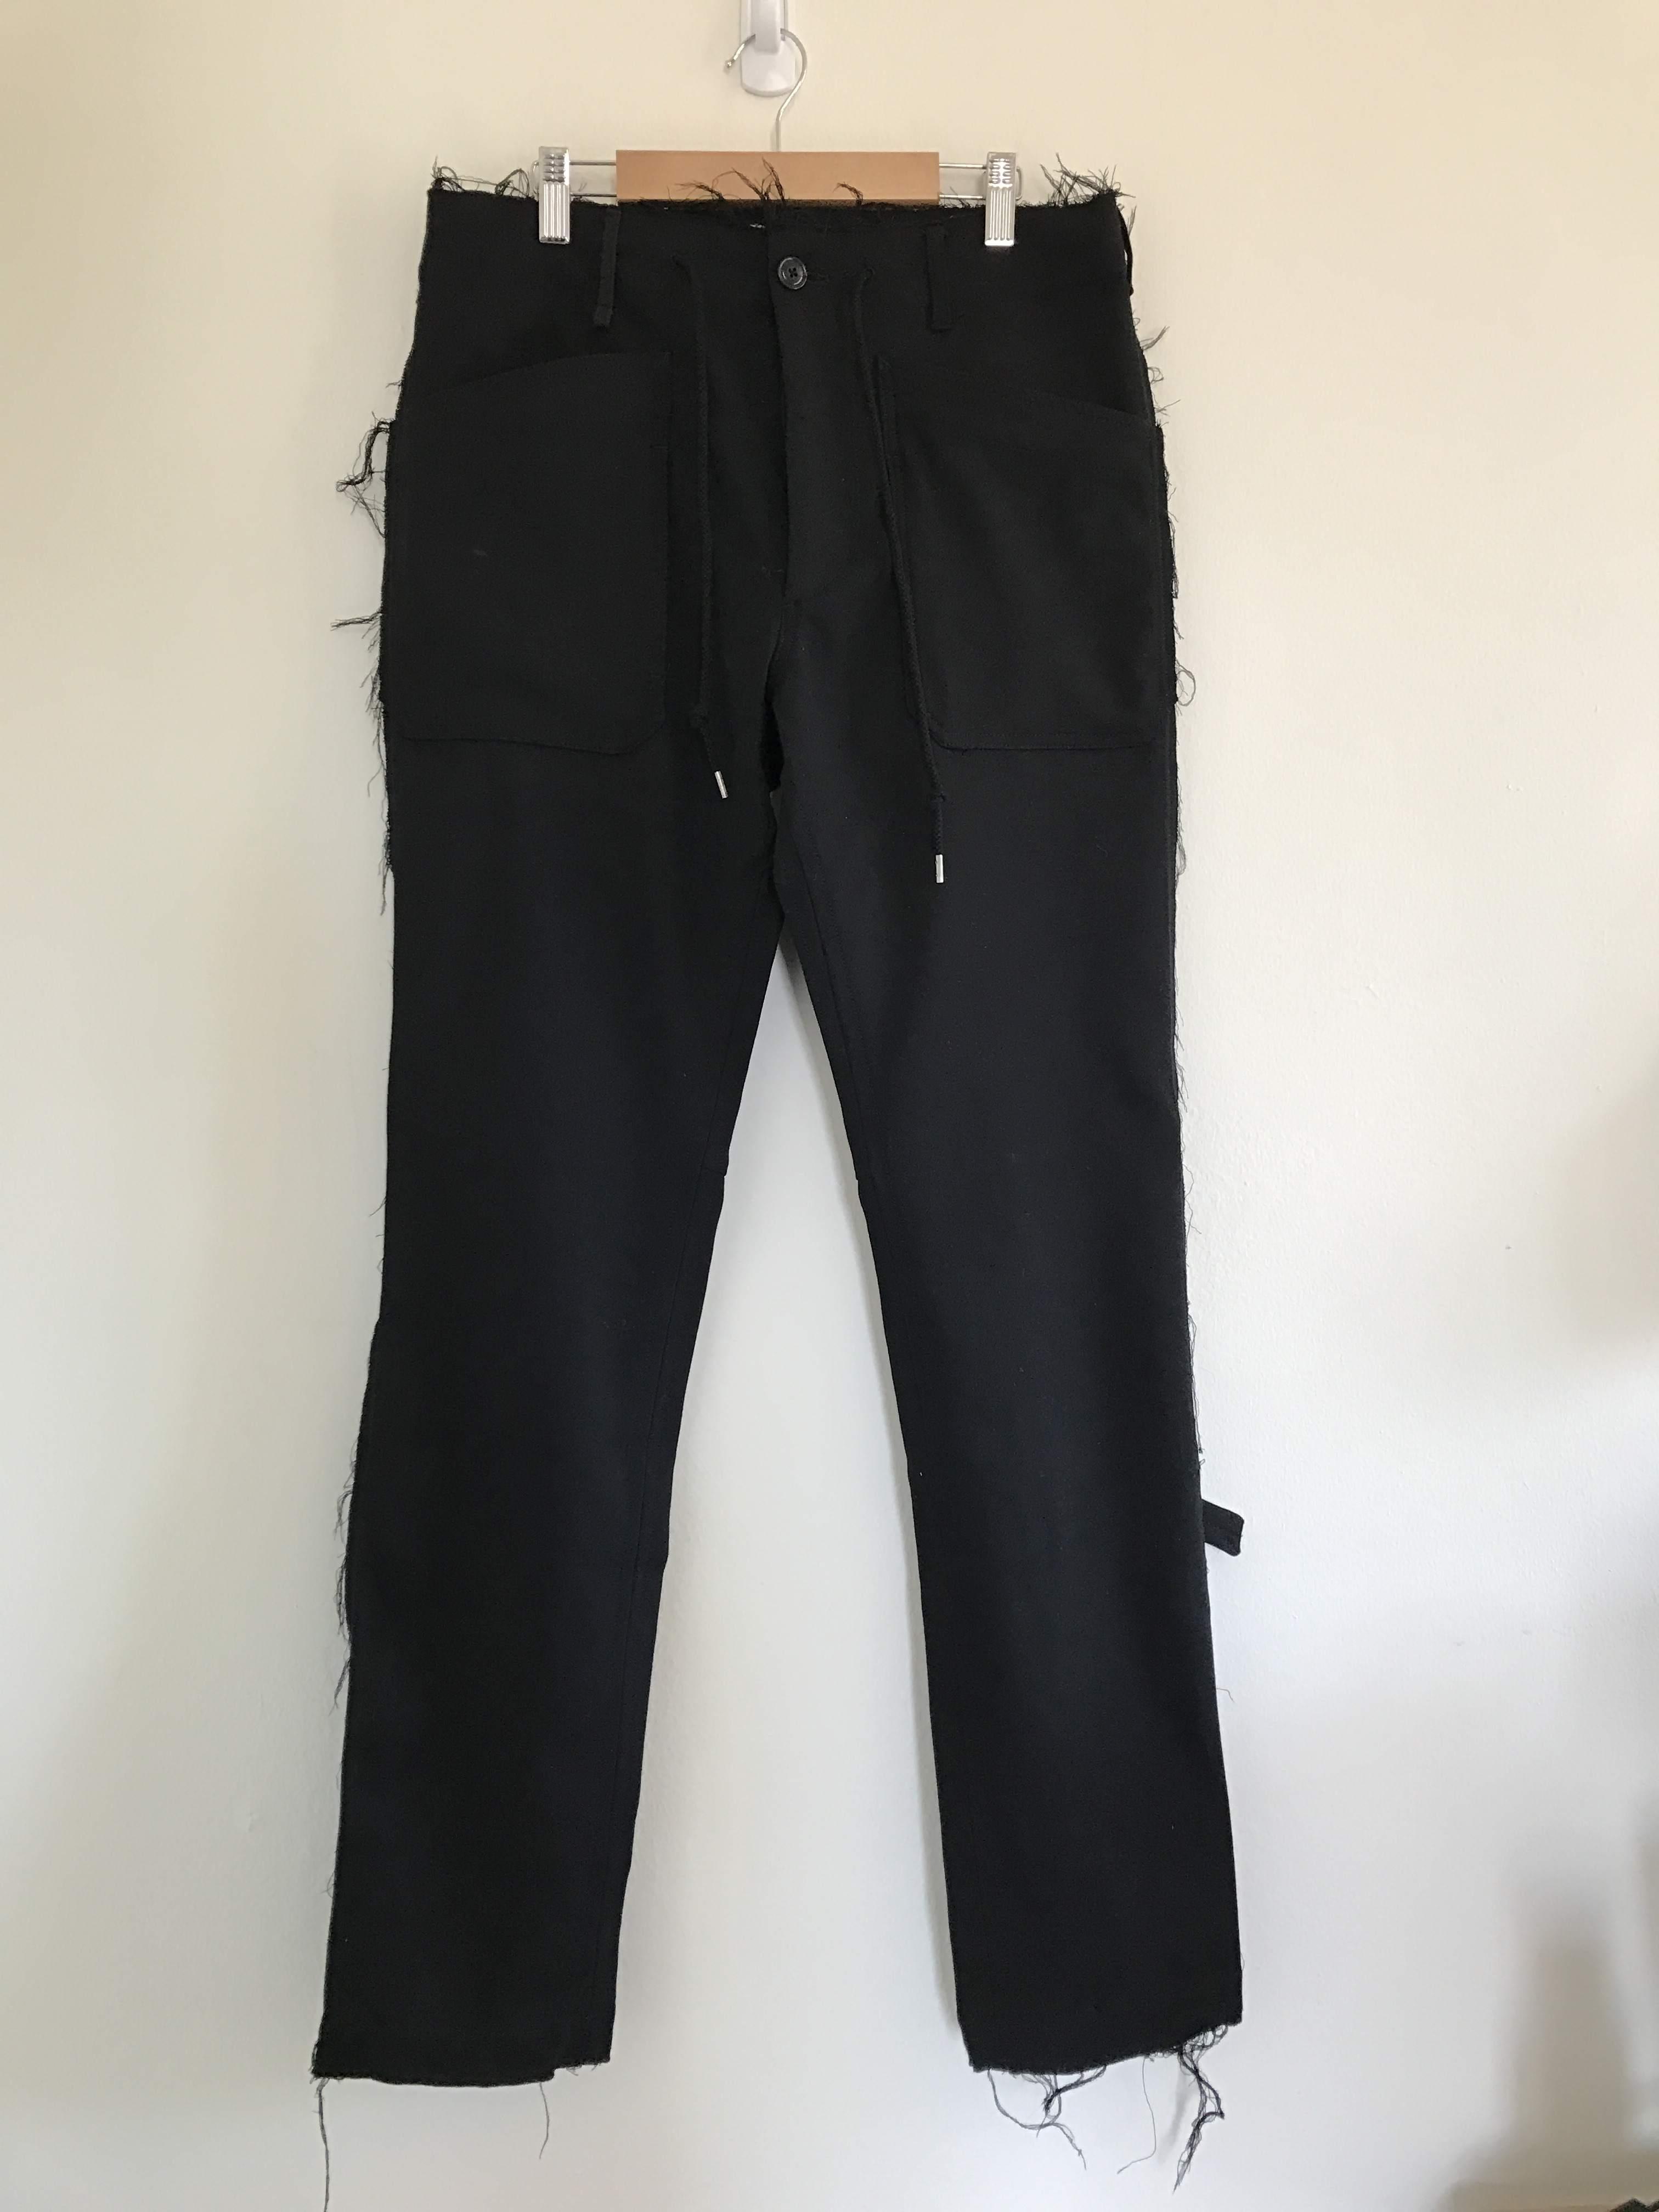 809f4602c1 TAKAHIROMIYASHITA THE SOLOIST. Wool Fatigue Trousers - bottoms - supertalk